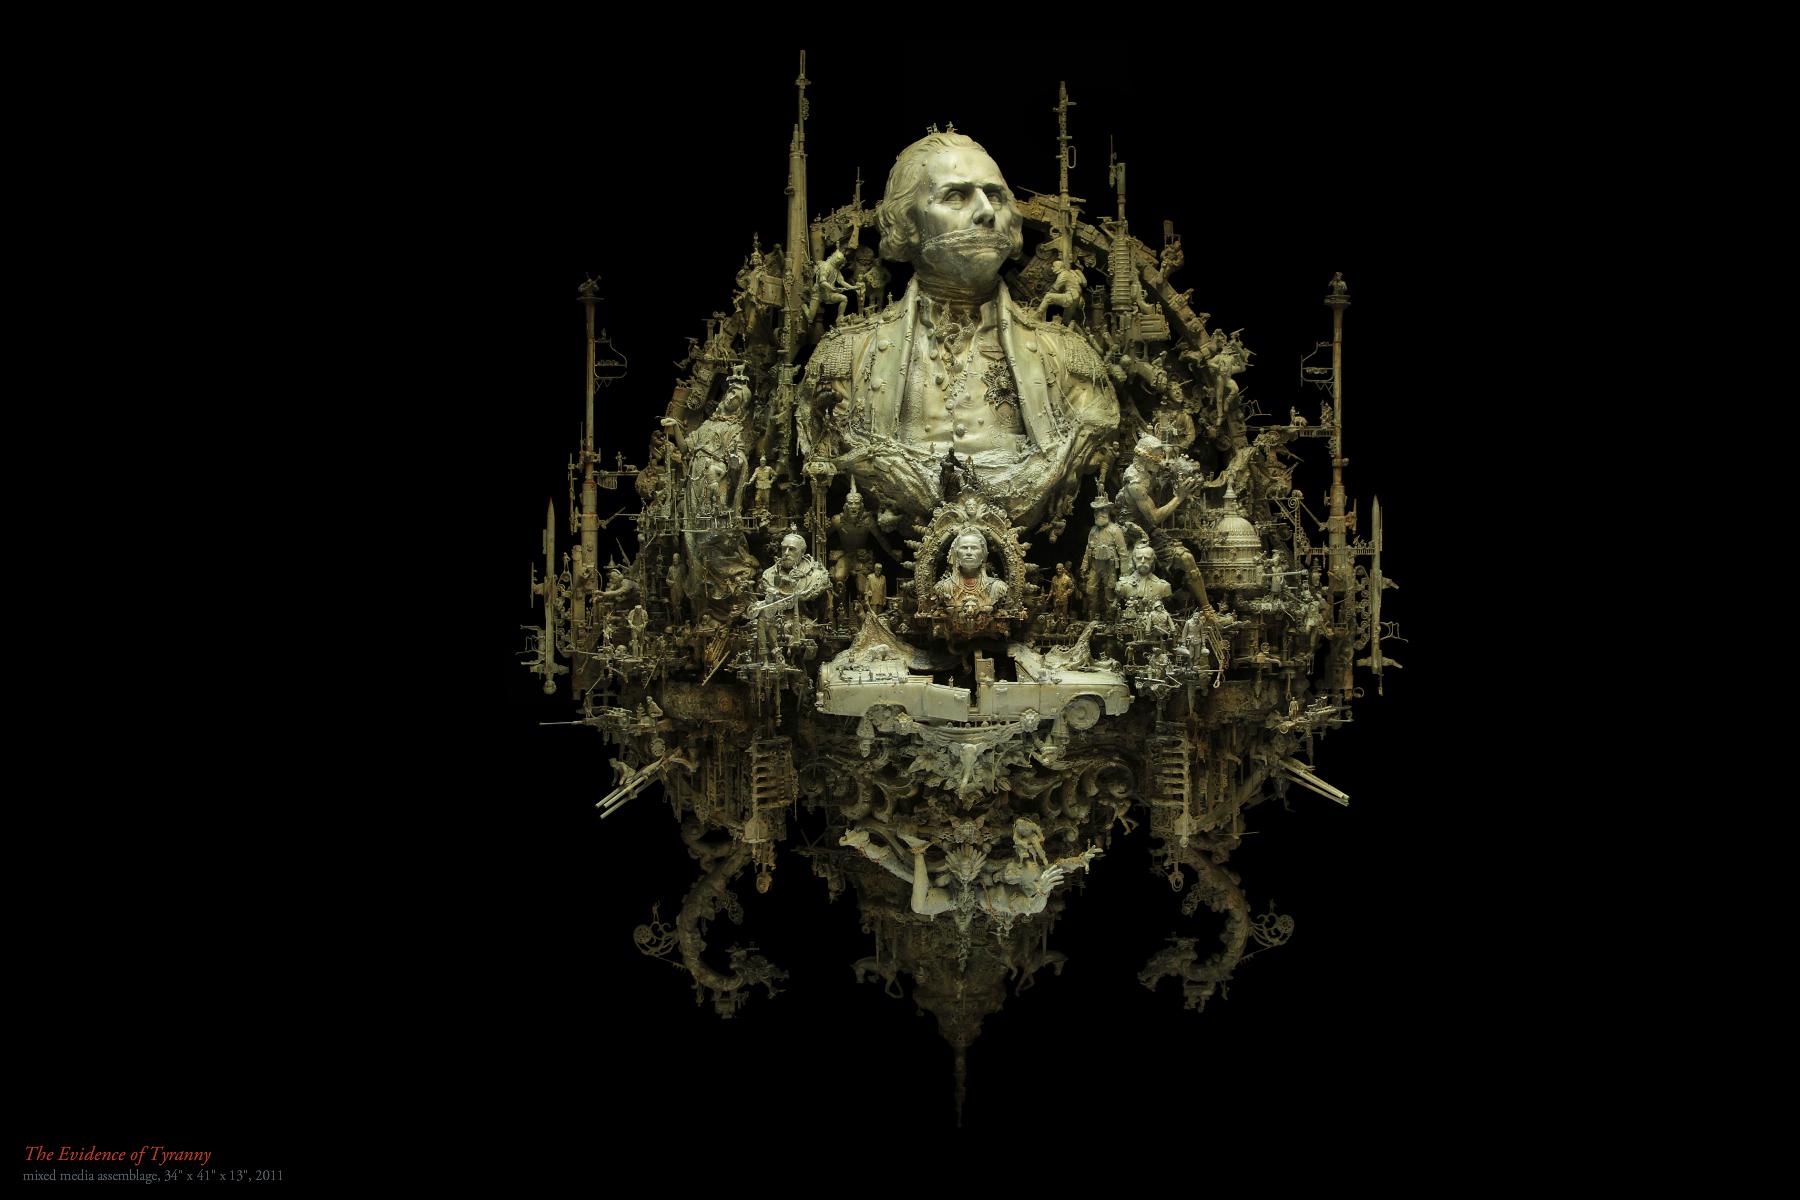 Kris Kuksi Art Sculptures dark sci-fi steampunk p ...